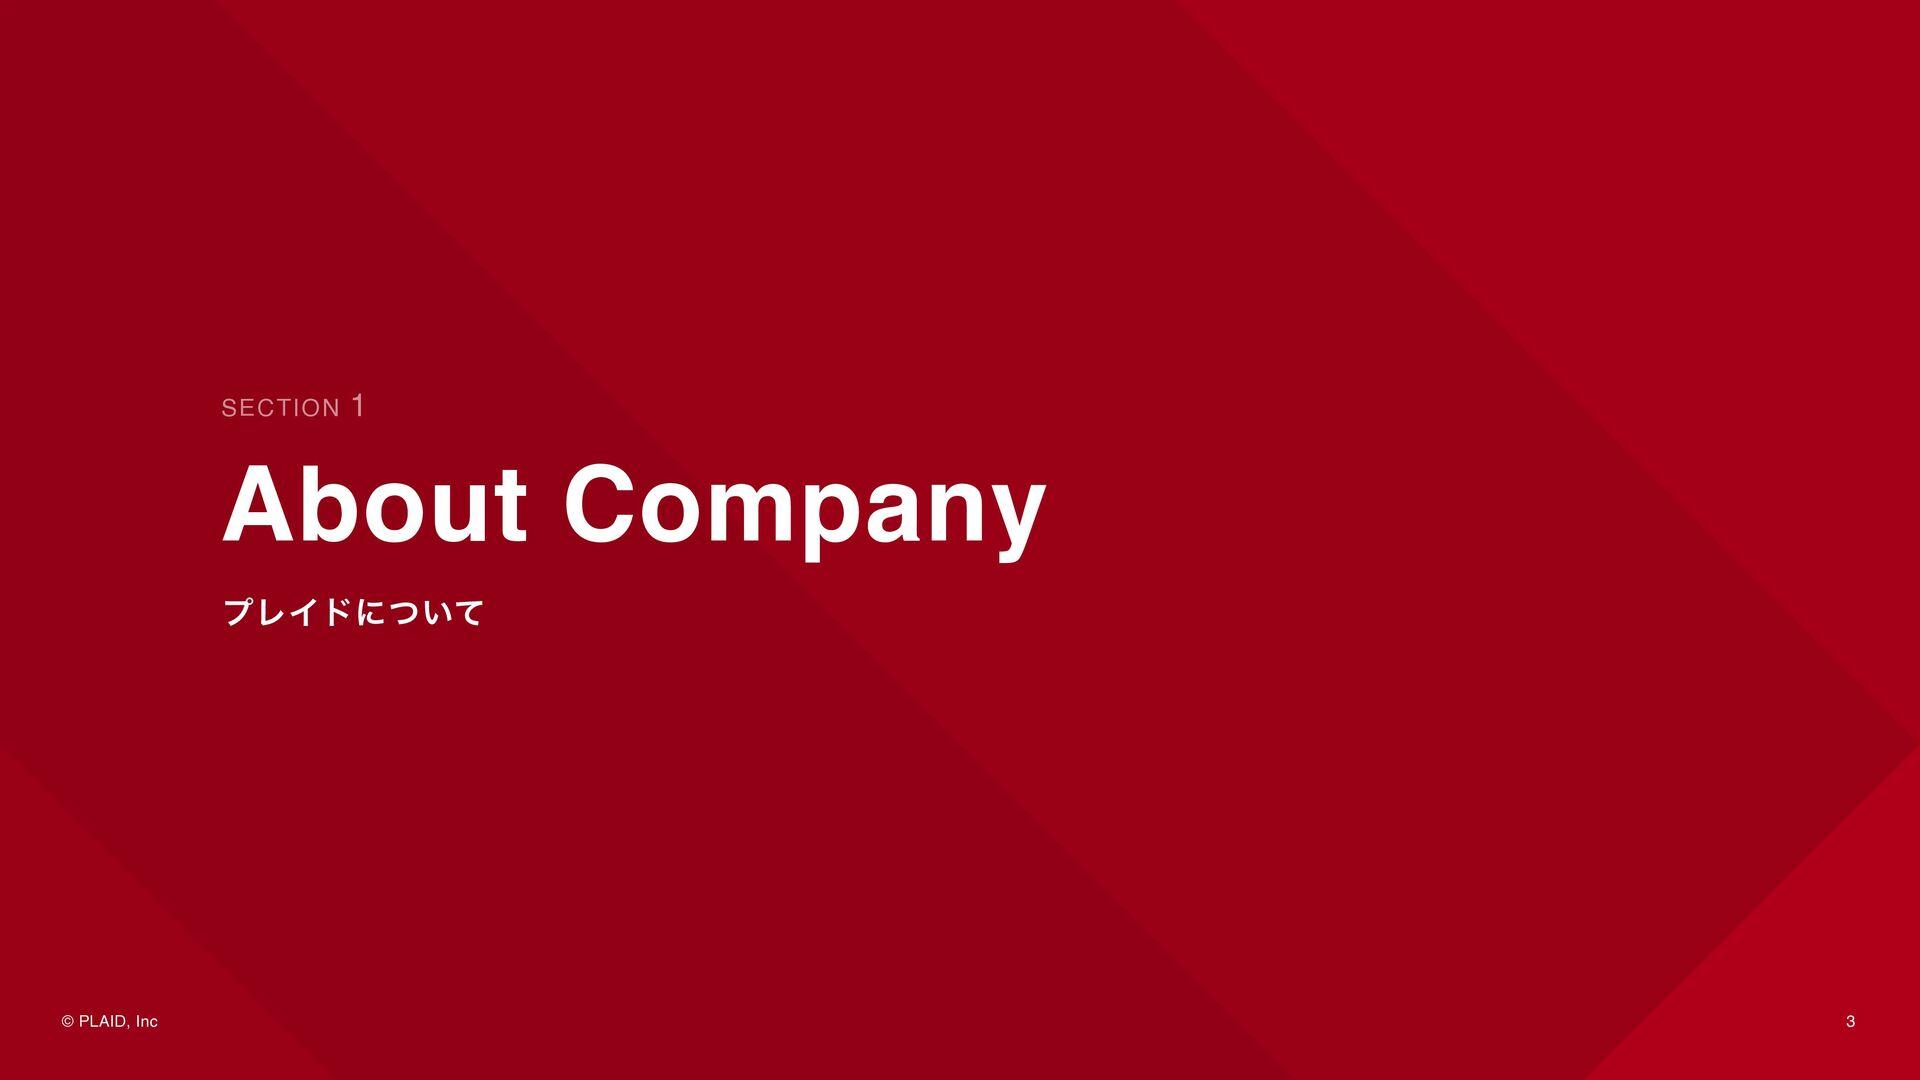 3 © PLAID, Inc About Company SECTION 1 プレイドについて